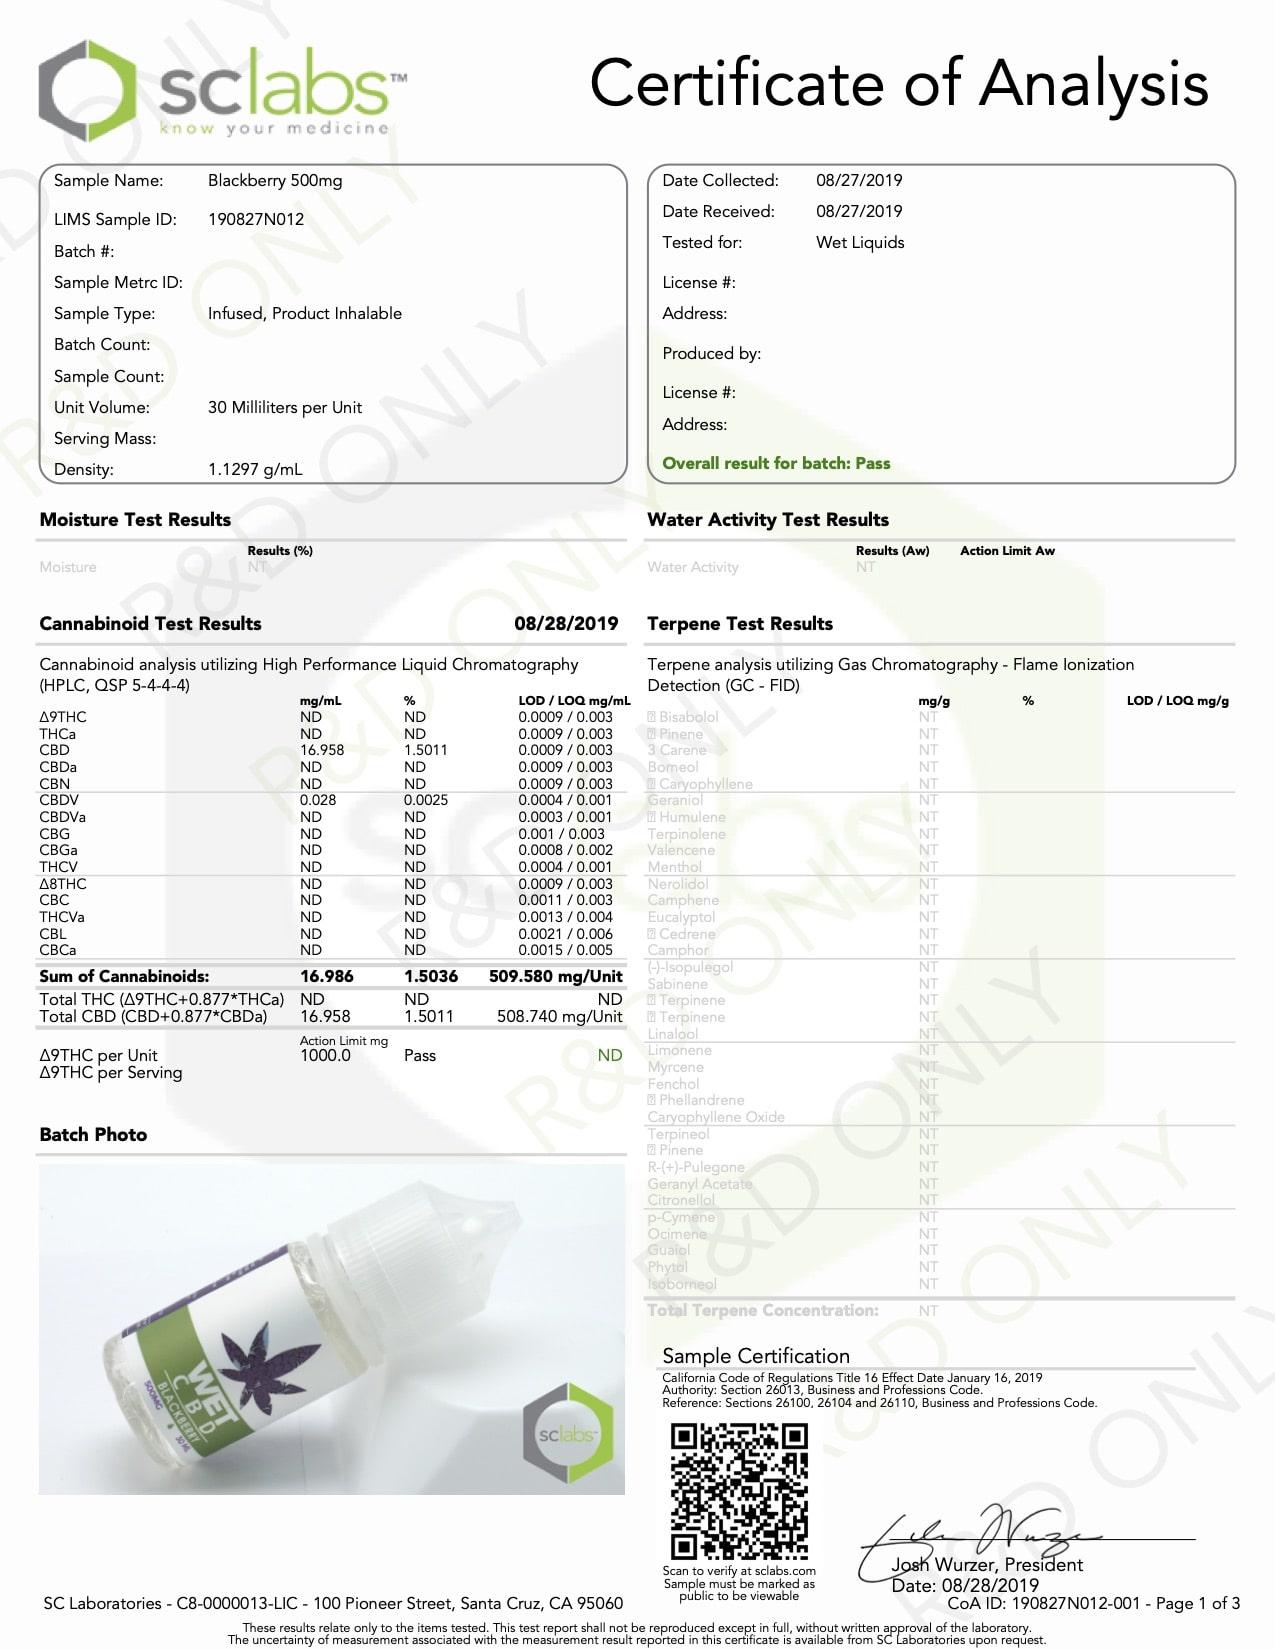 WET CBD Vape Blackberry 500mg Lab Report